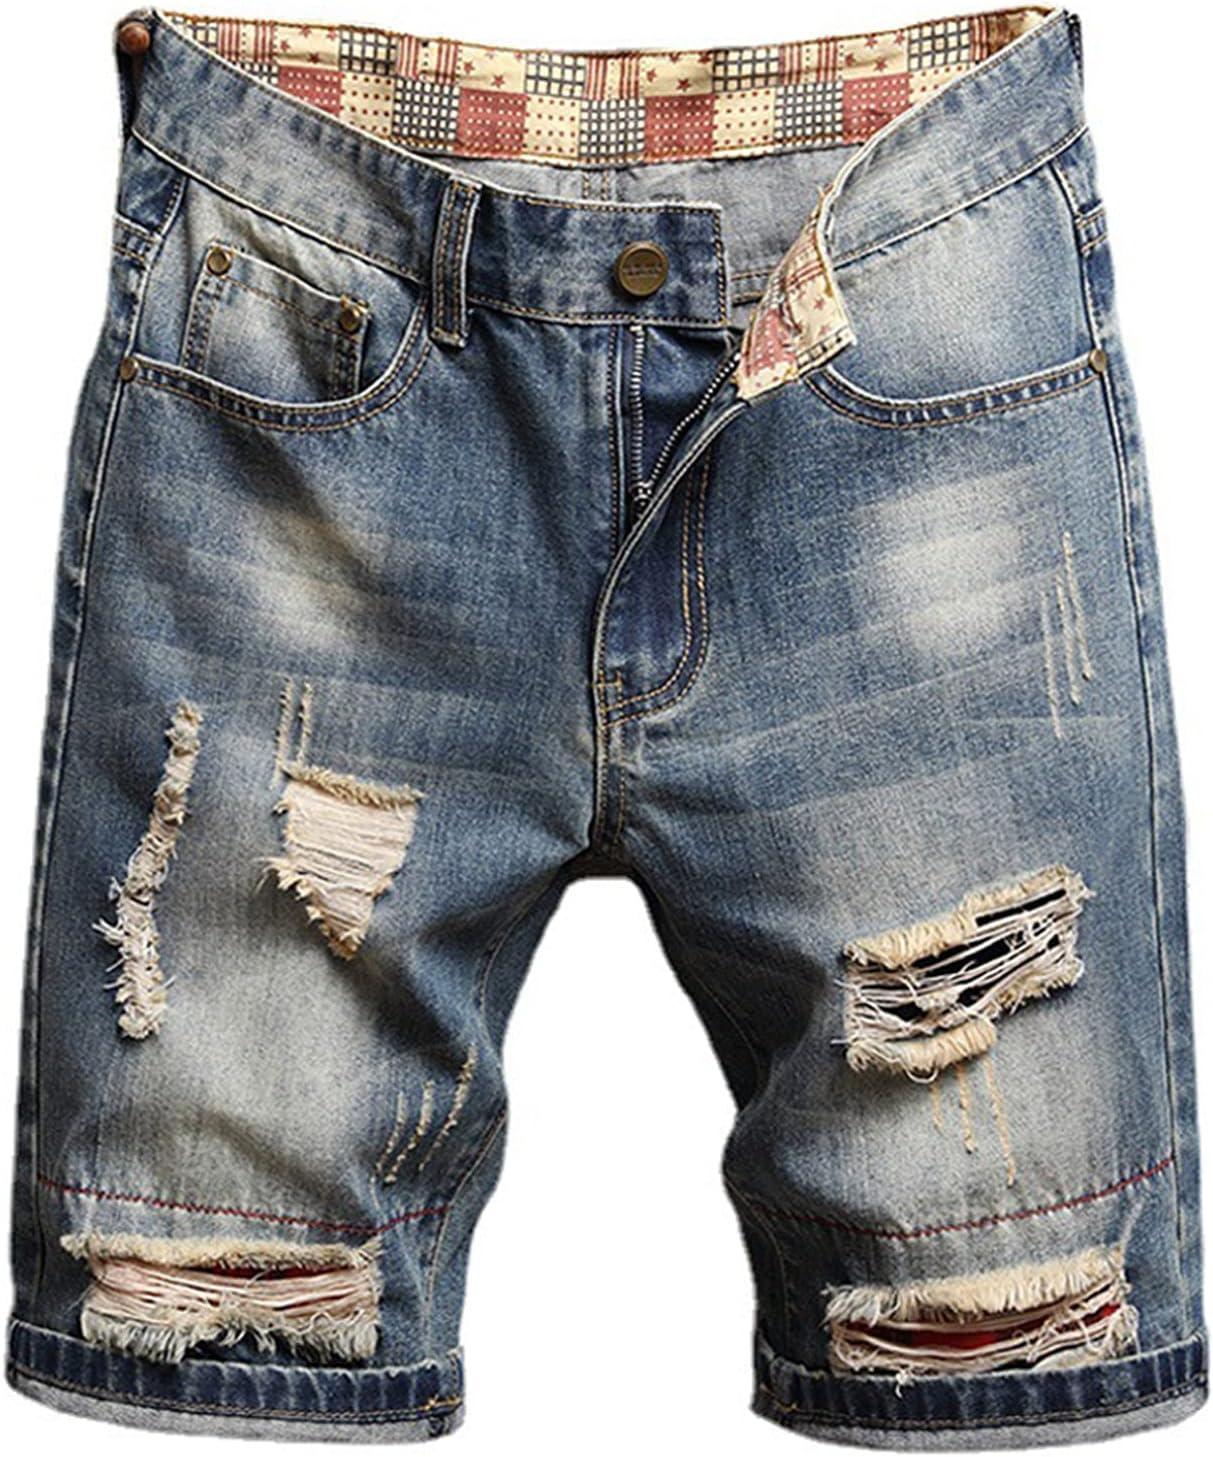 Men's Ripped Retro Shorts Biker Distressed Loose Short Jeans Summer Straight Denims Short-Pant With Broken Hole (Blue 12,29)